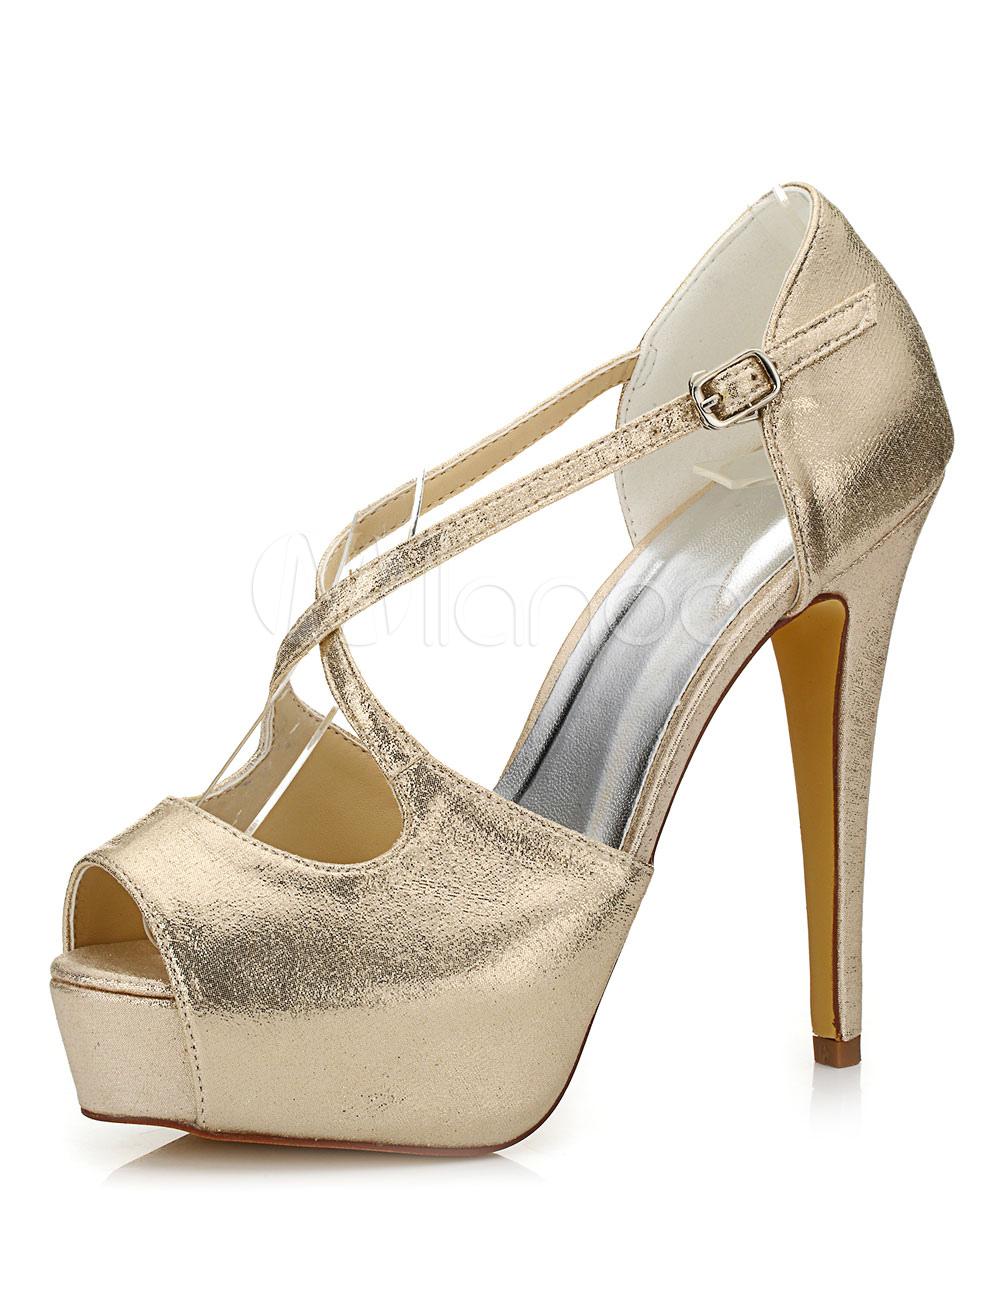 Buy Peep Wedding Shoes Platform Sandals Women's High Heel Criss-Cross Stiletto Bridal Shoes for $56.99 in Milanoo store